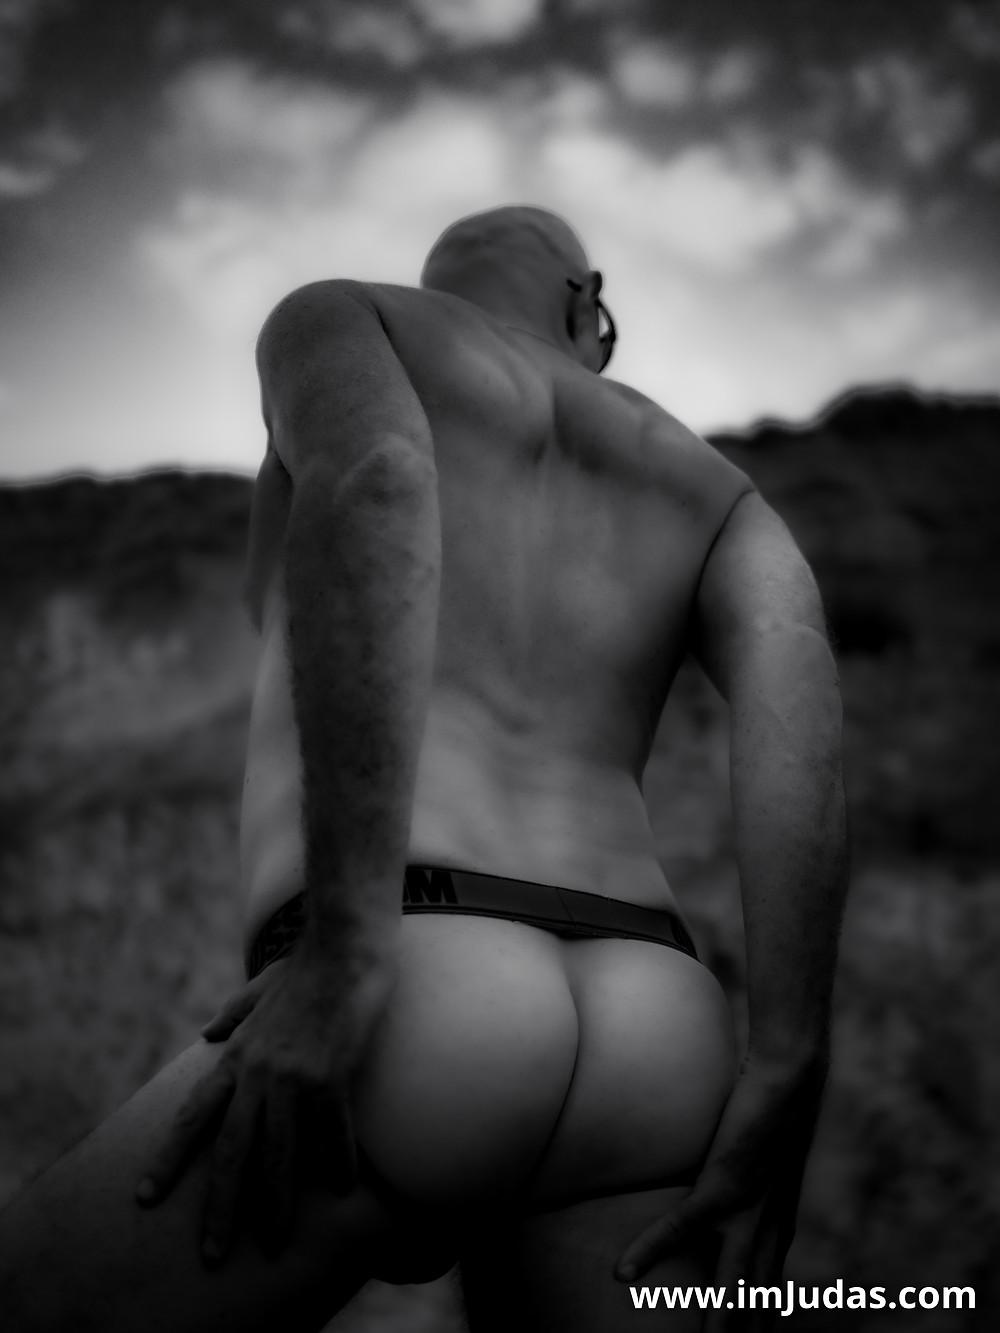 jocks ass naked male model sex gay